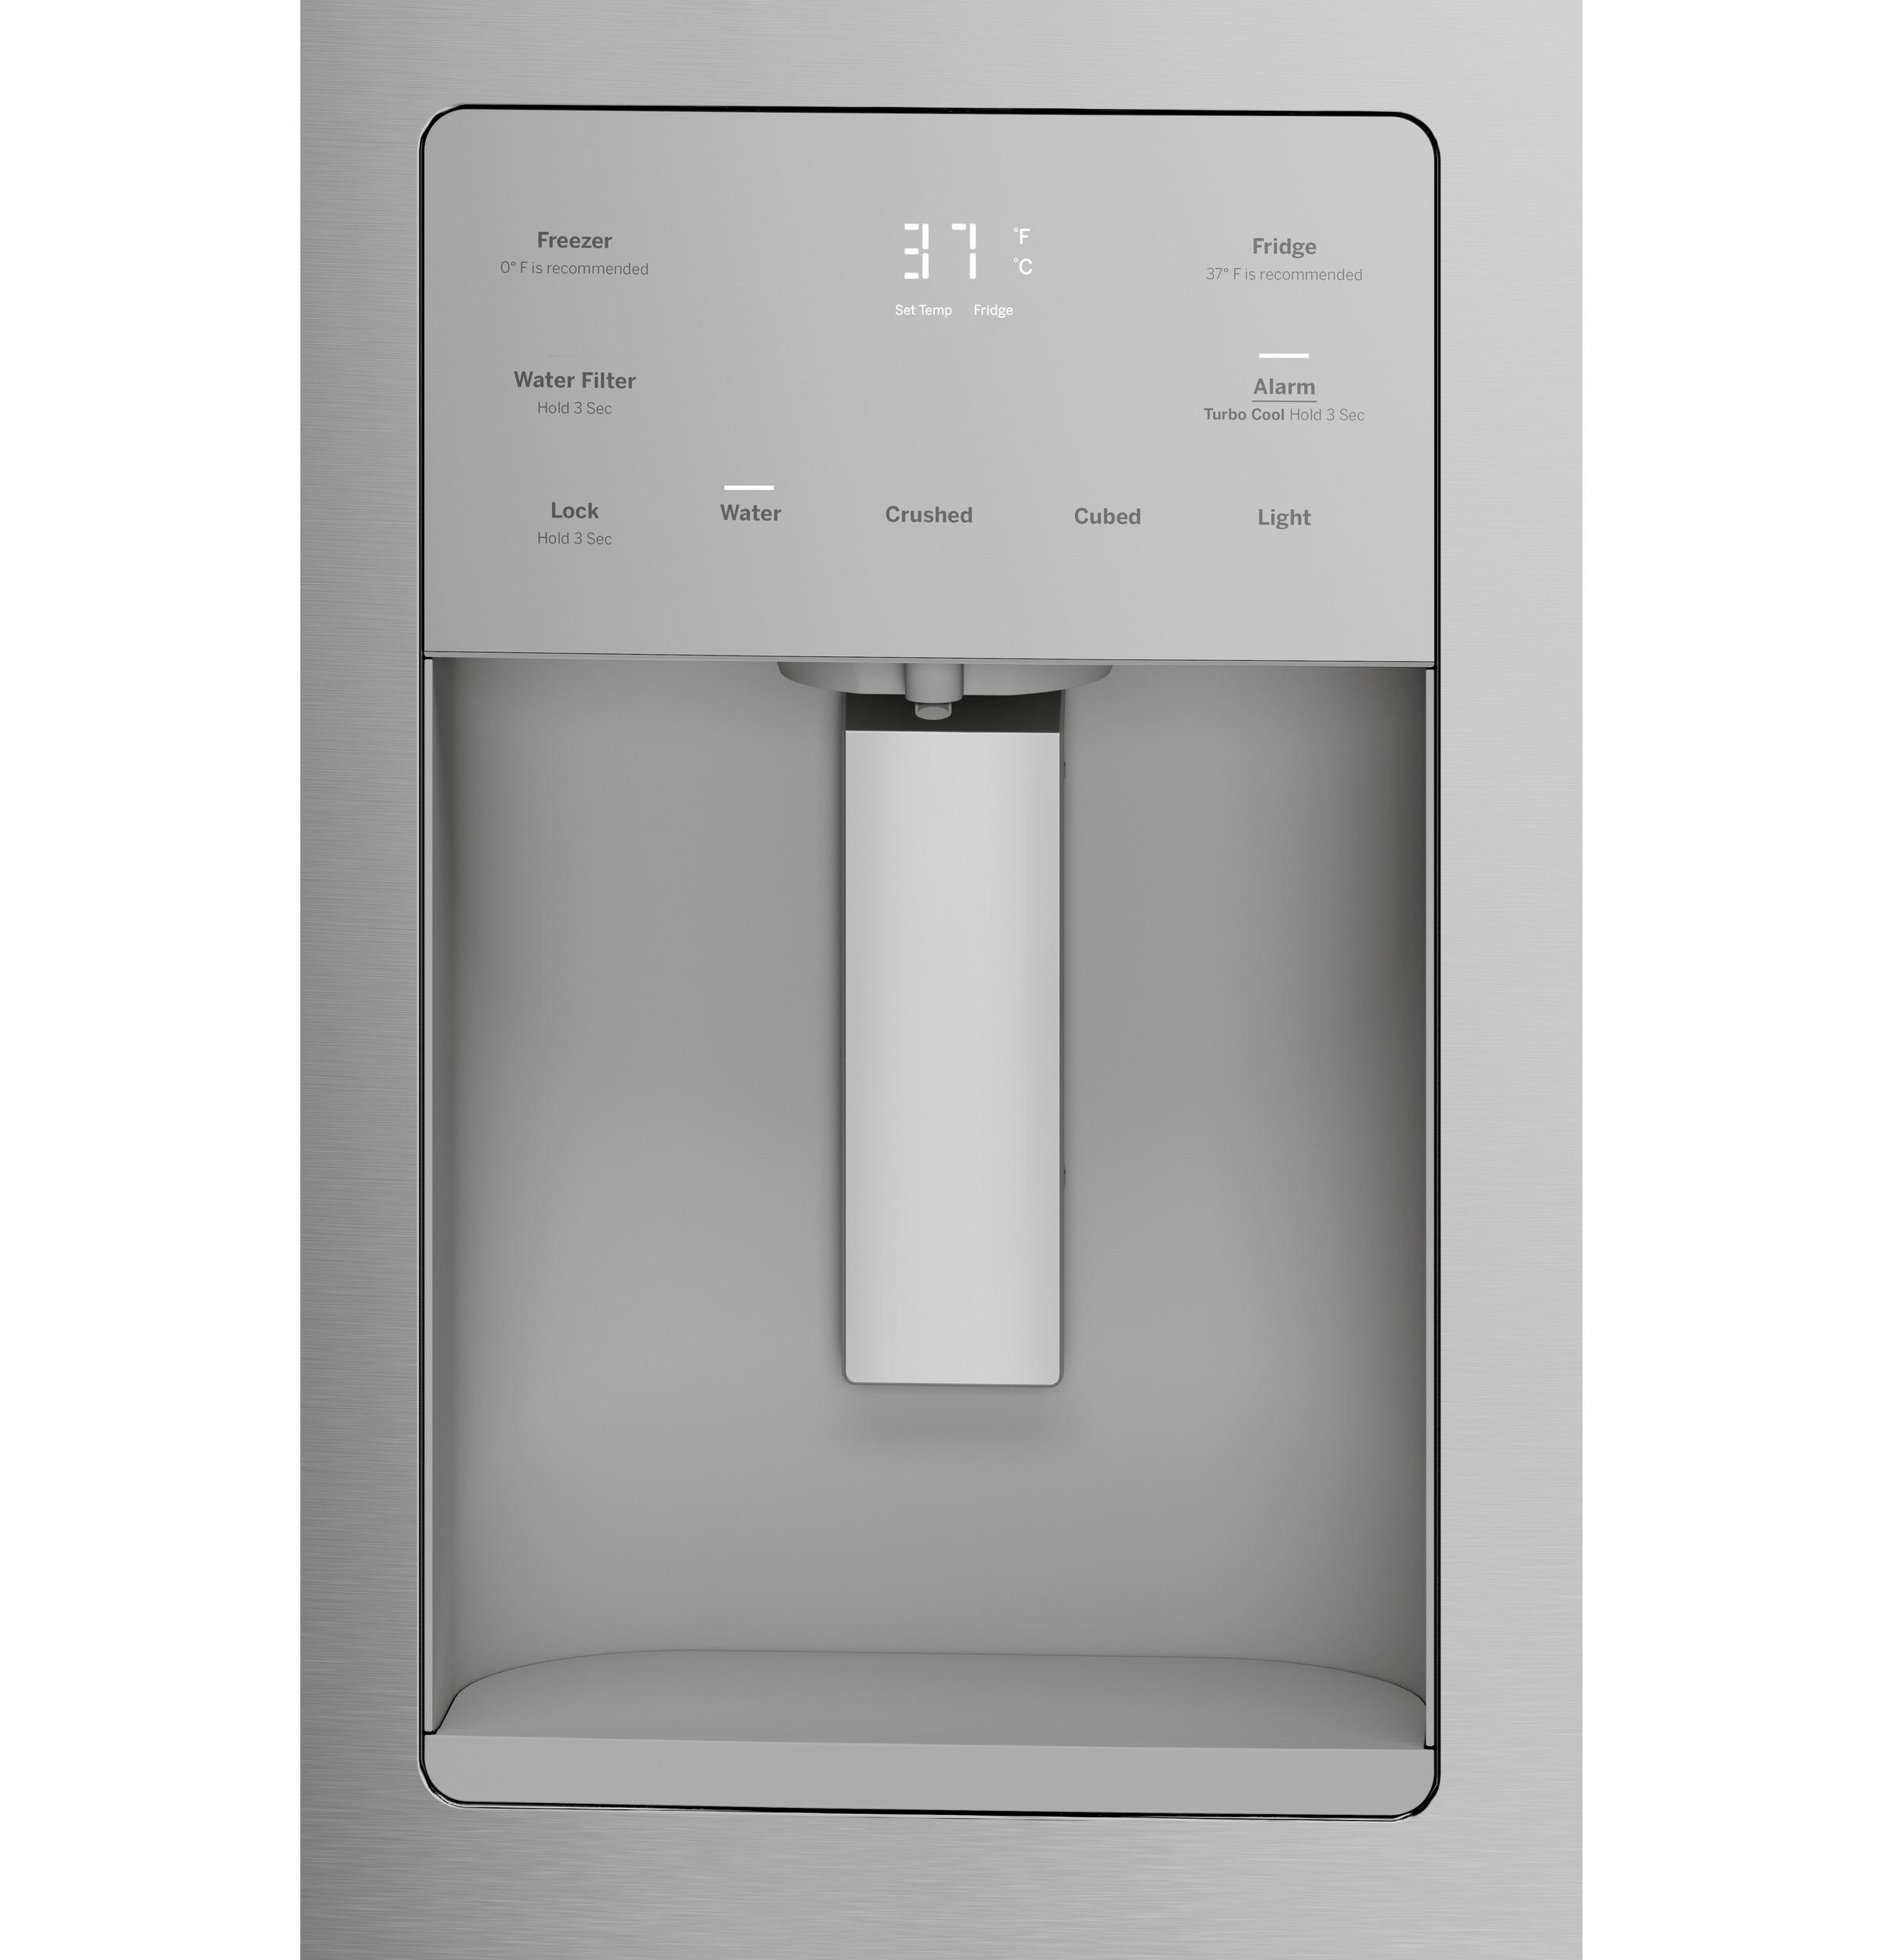 Model: GFE26JSMSS | GE GE® ENERGY STAR® 25.6 Cu. Ft. French-Door Refrigerator